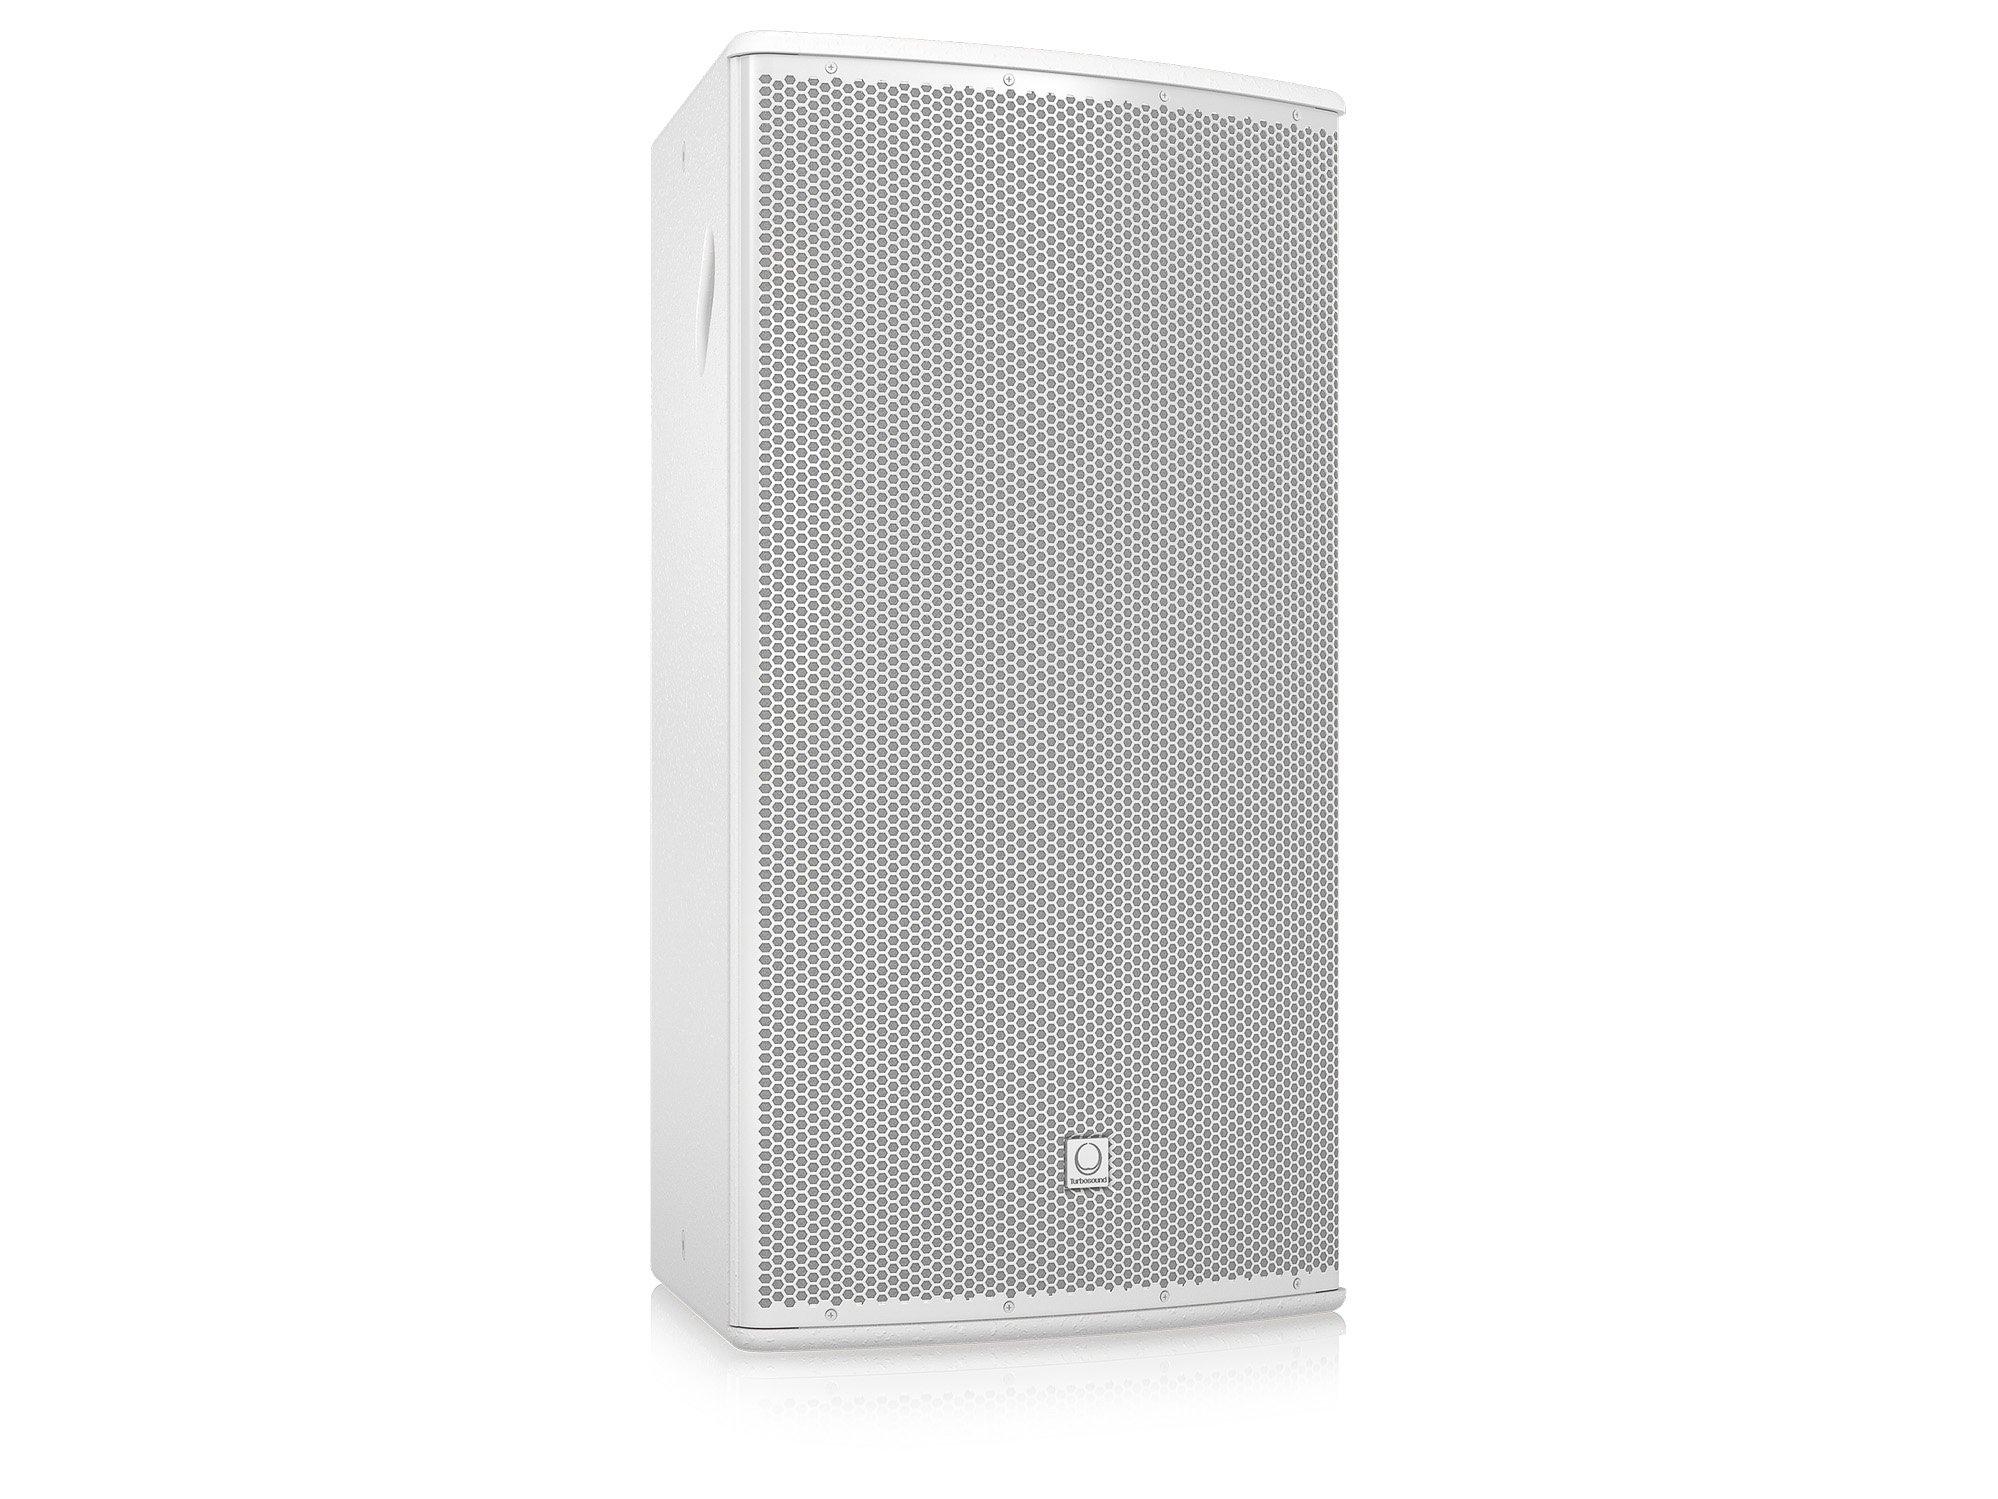 "15"" 500W (8 Ohms) 2-Way Full-Range Passive/Bi-Amp Loudspeaker with Klark Teknik DSP, ULTRANET Networking, and 90°x60° Dispersion in White"